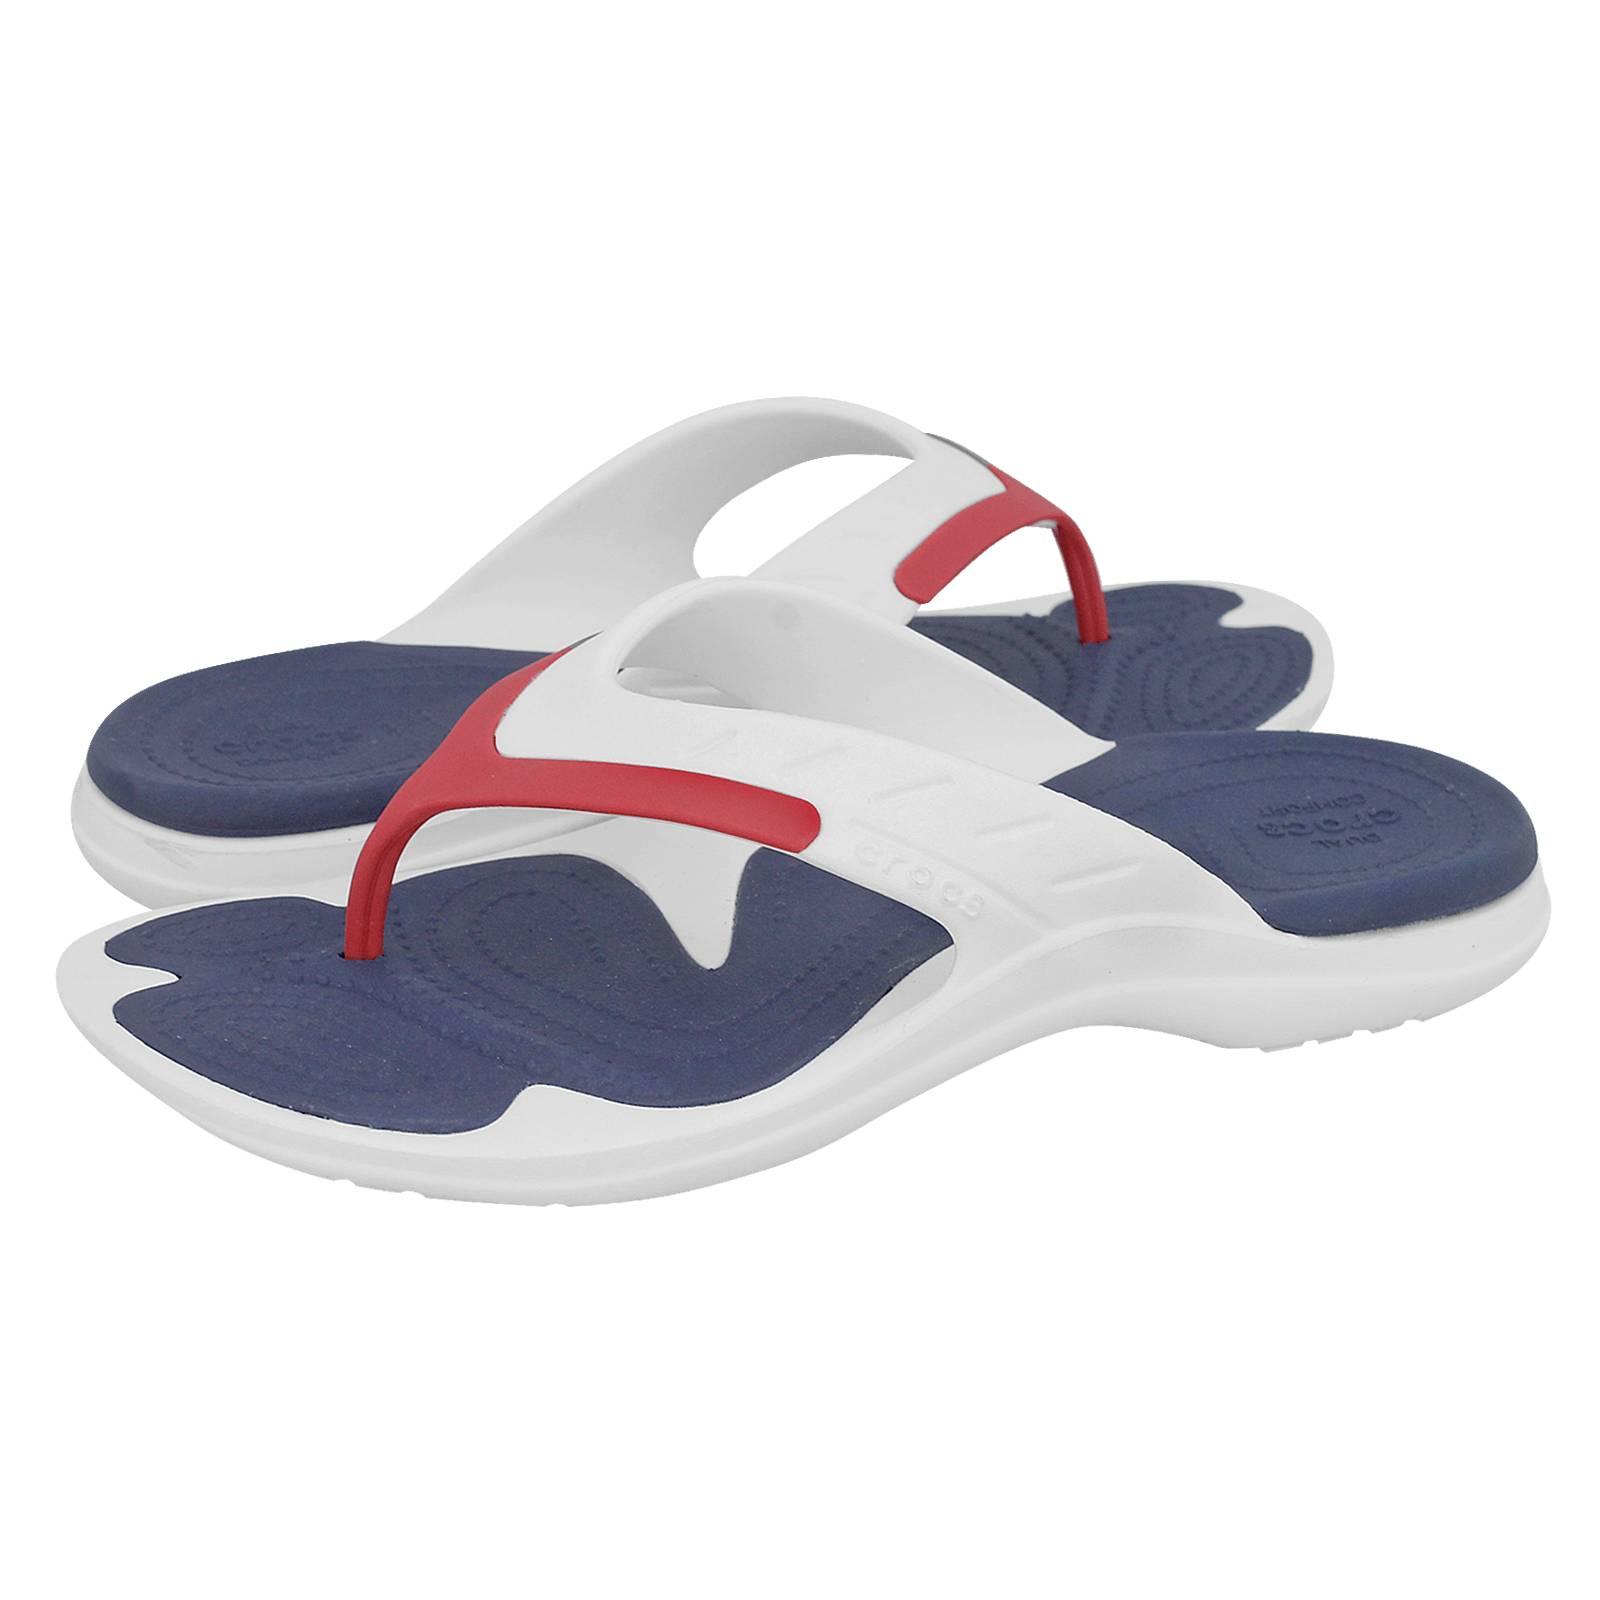 a0a15821817 Modi Sport Flip - Ανδρικά σανδάλια Crocs από croslite - Gianna ...